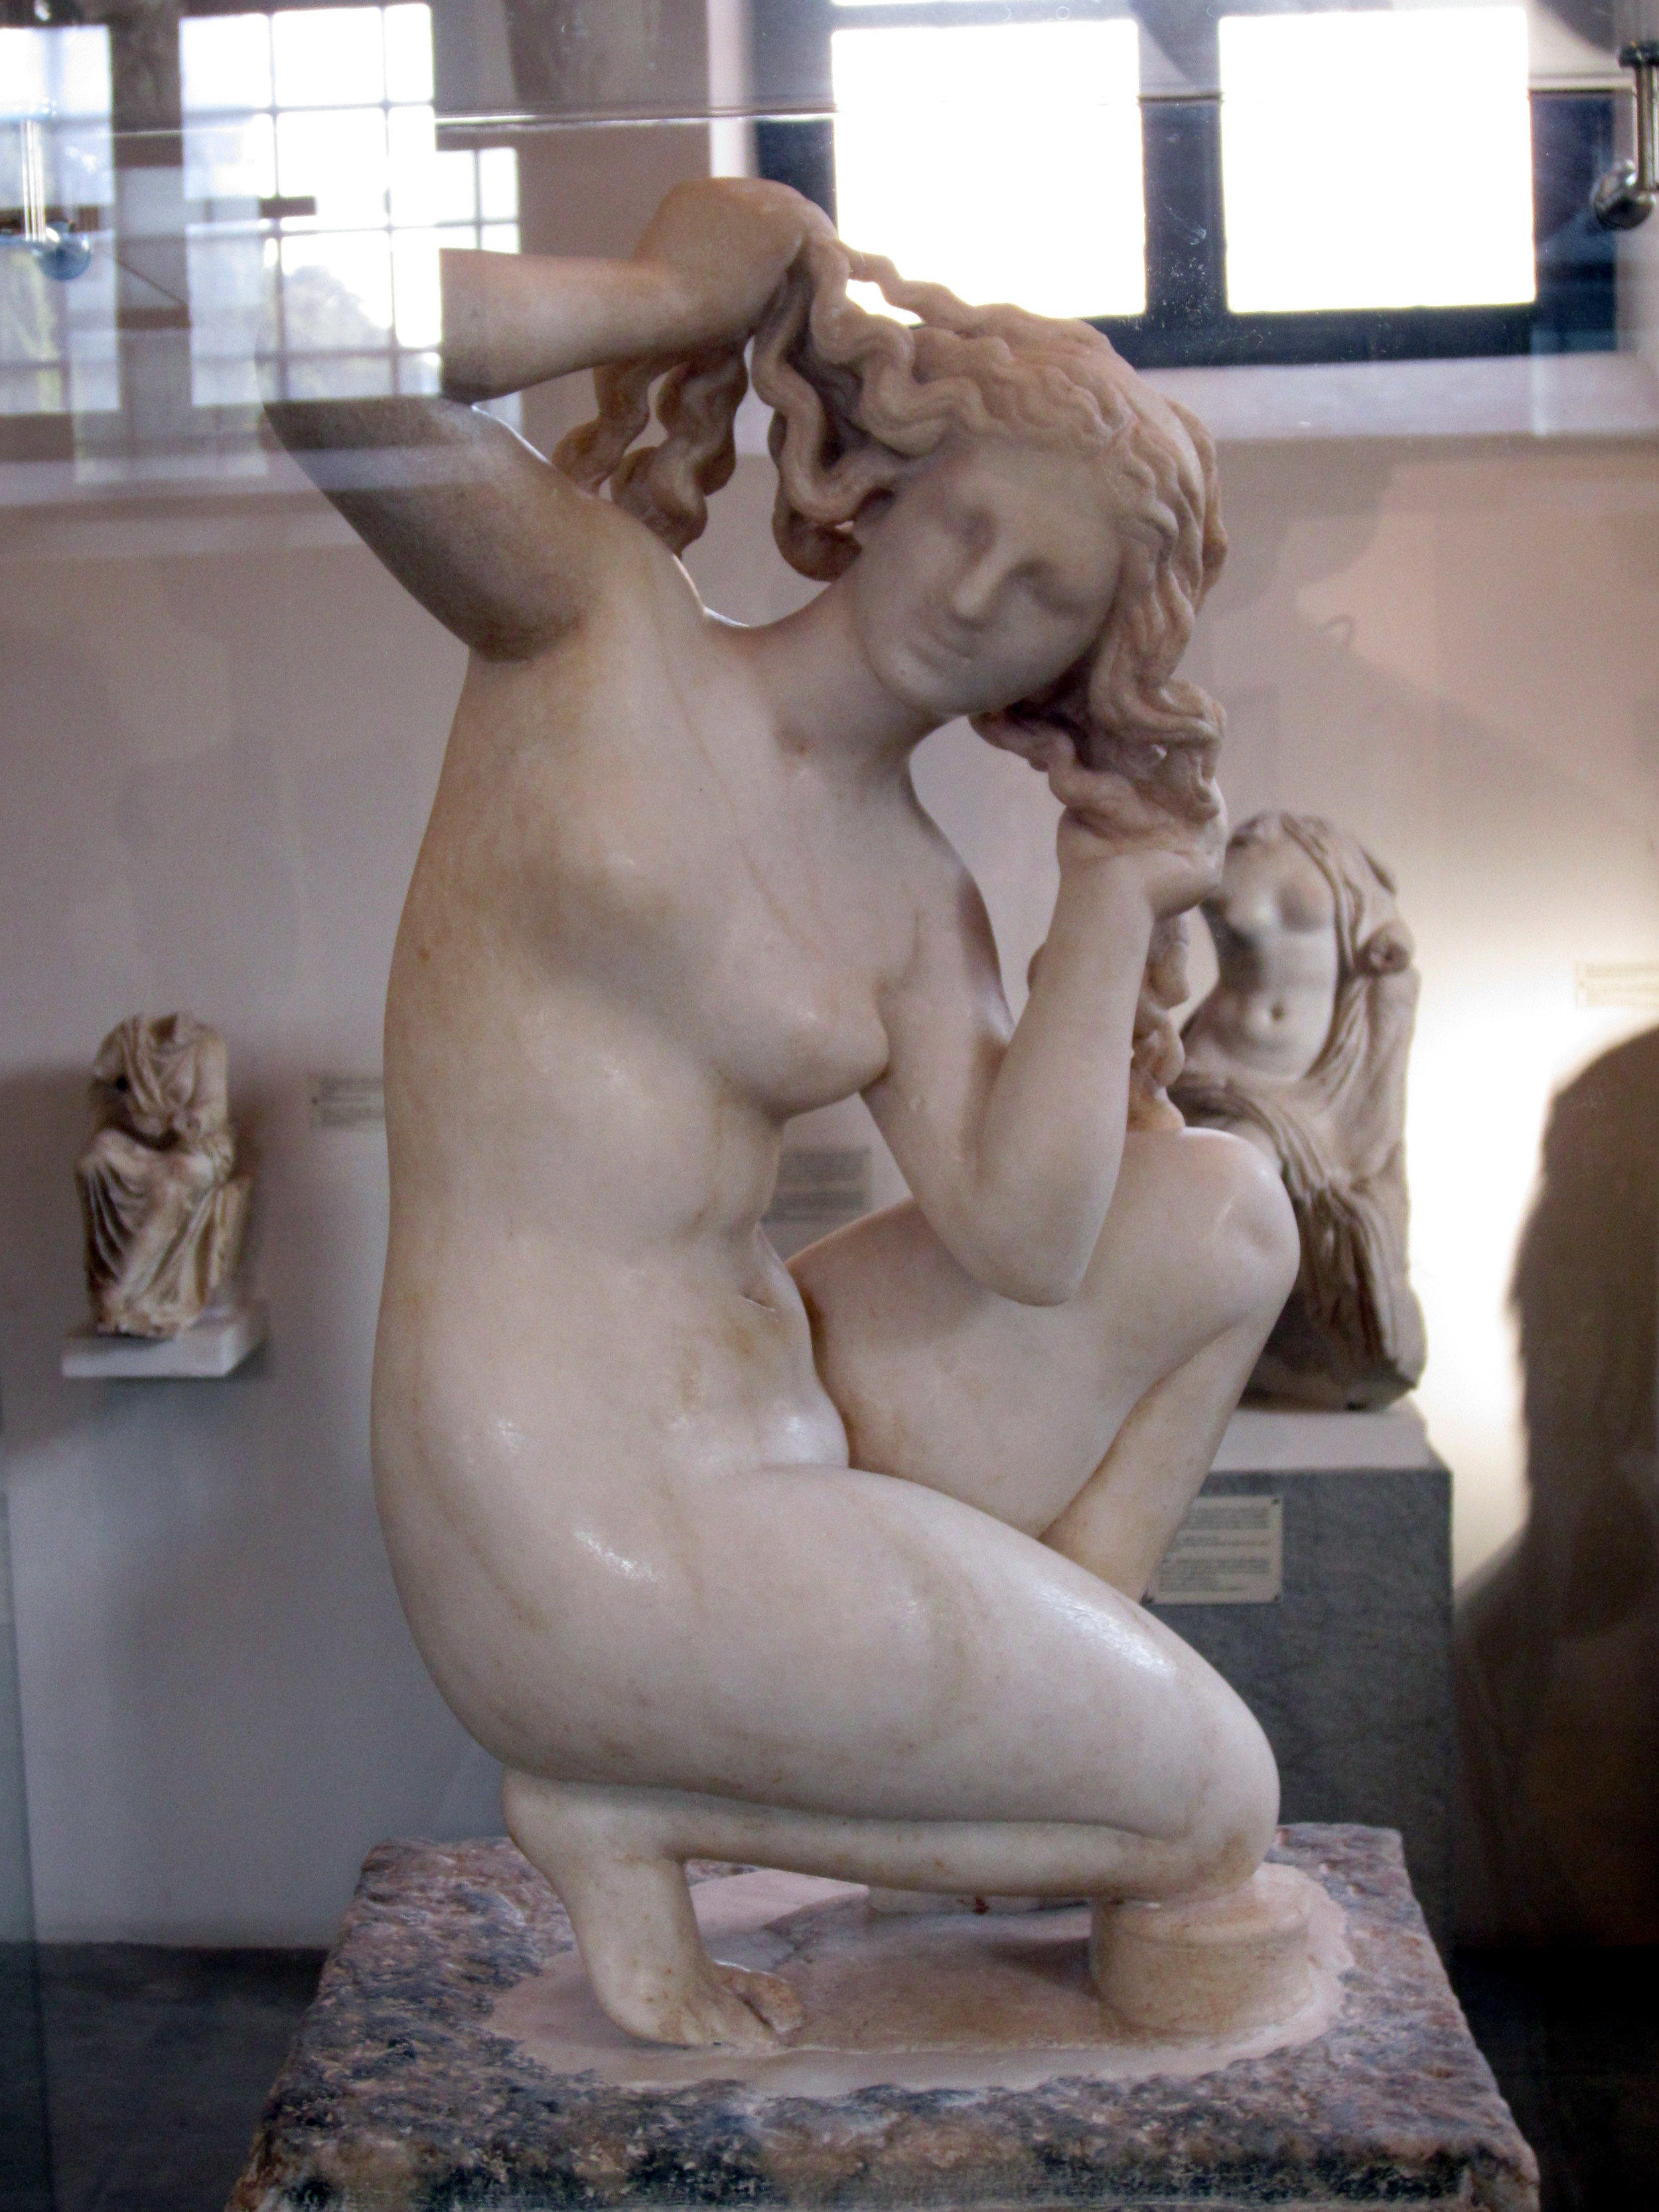 Aphrodite her self